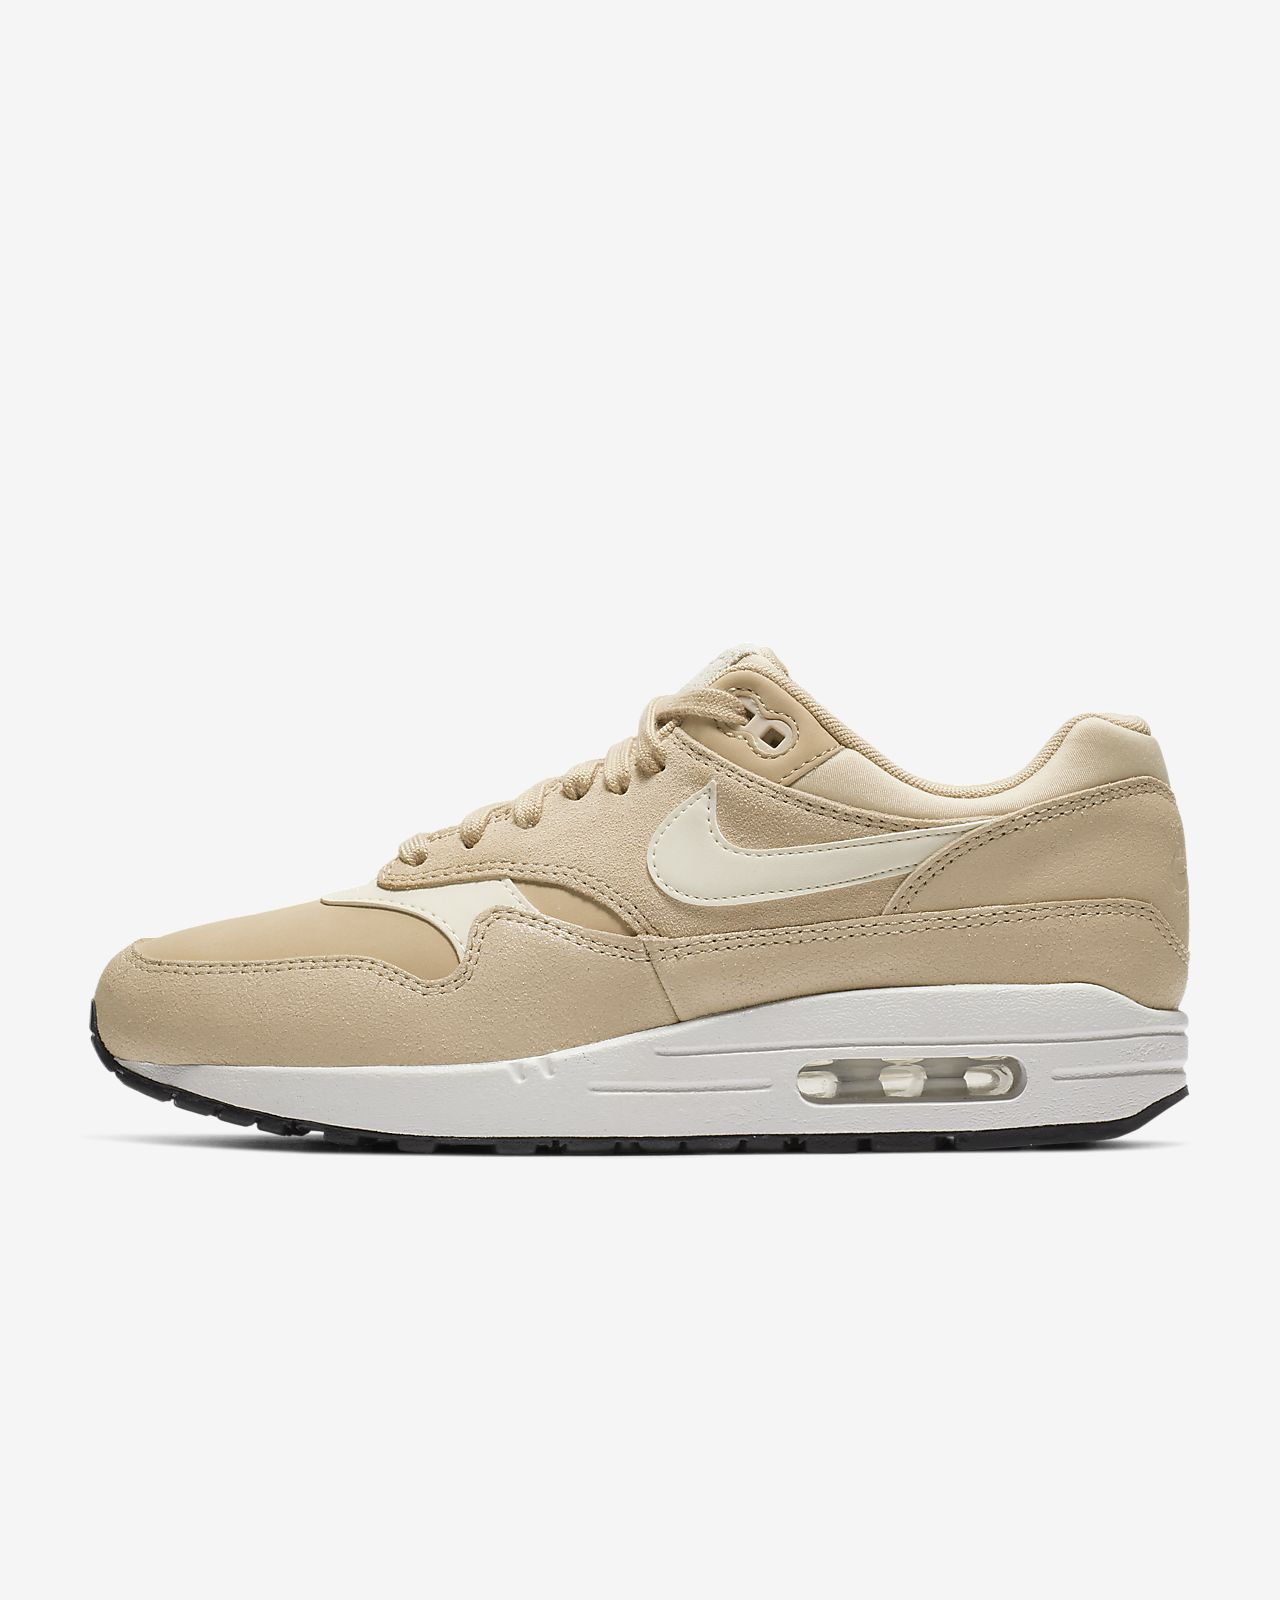 2ddd5861596 Nike Air Max 1 Premium - sko til kvinder. Nike.com DK